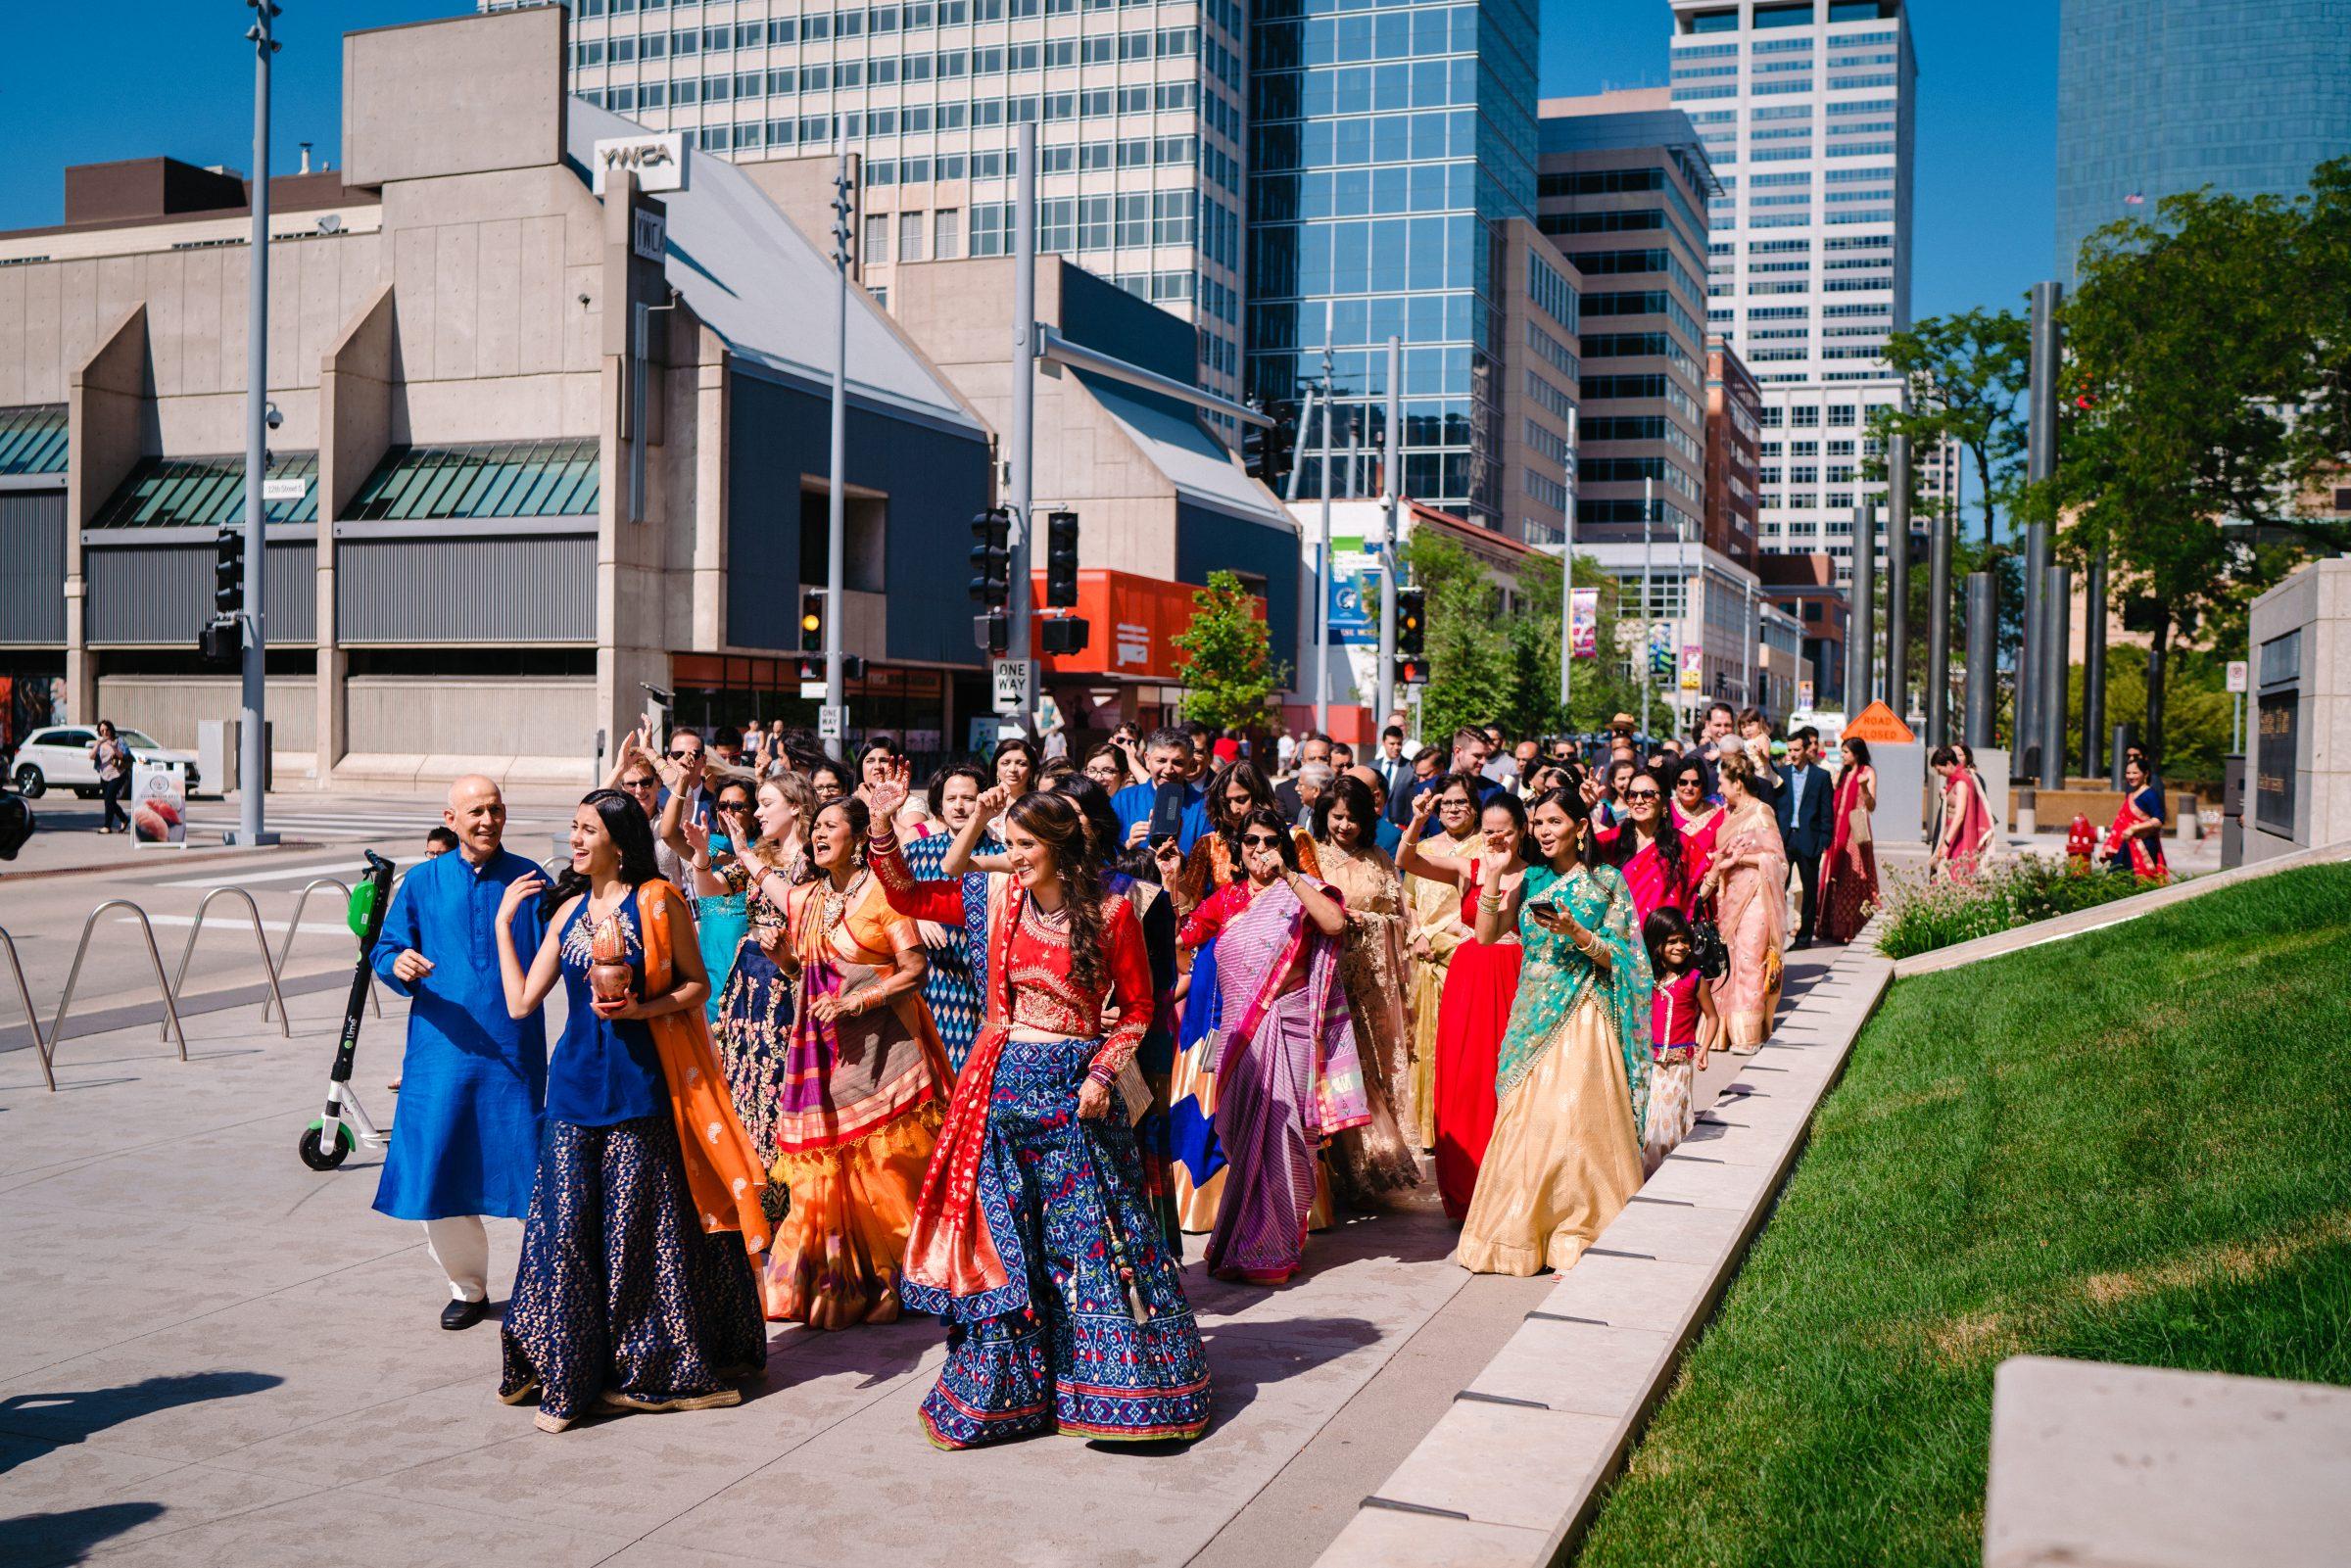 Indian wedding baraat at multicultural wedding